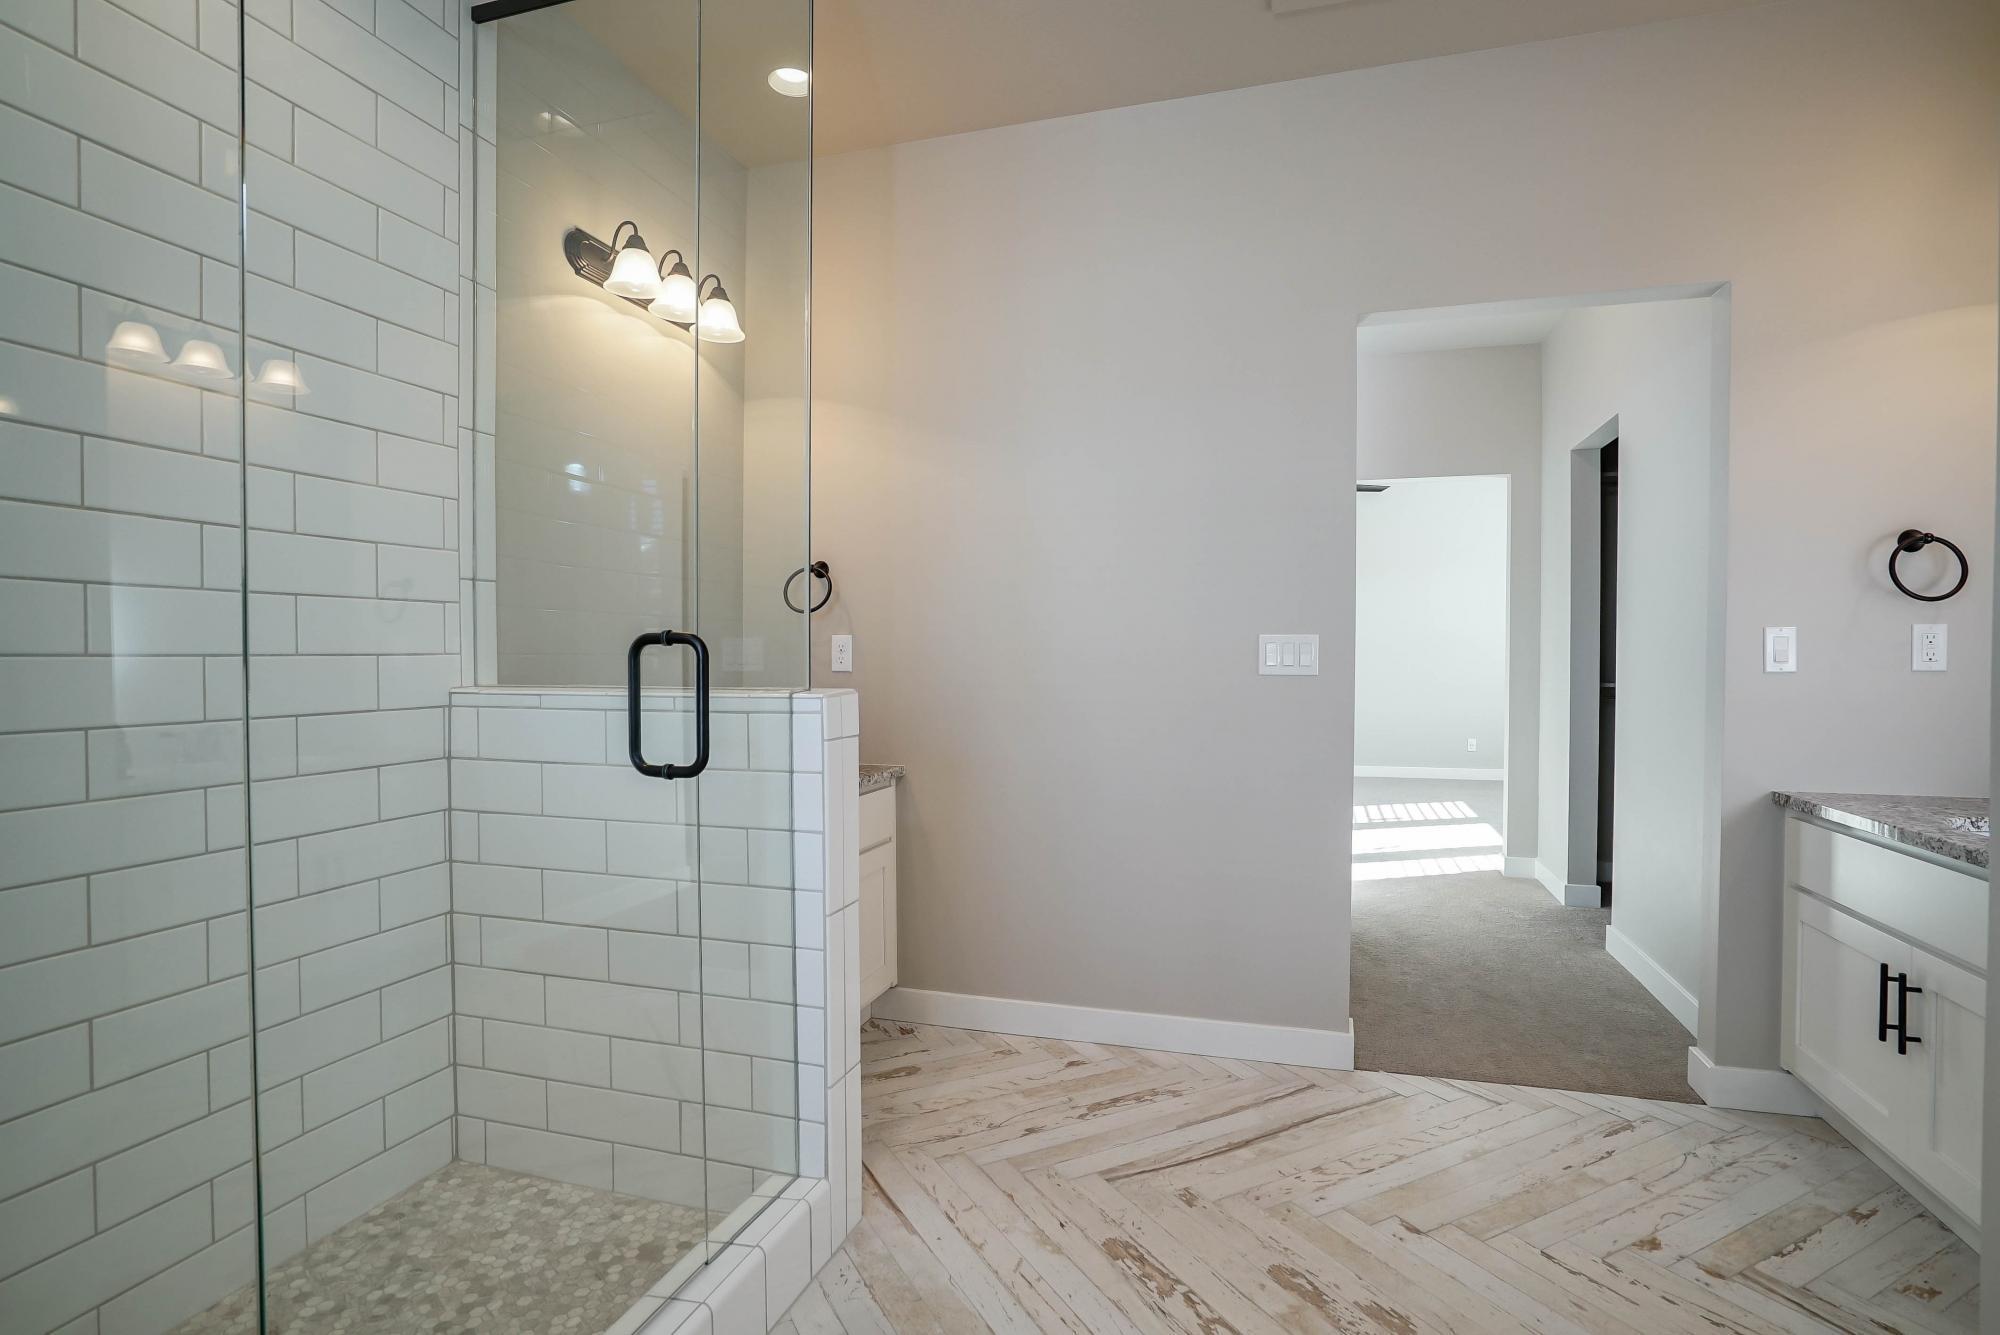 Bathroom featured in the Hillsboro By Destination Homes in Salt Lake City-Ogden, UT